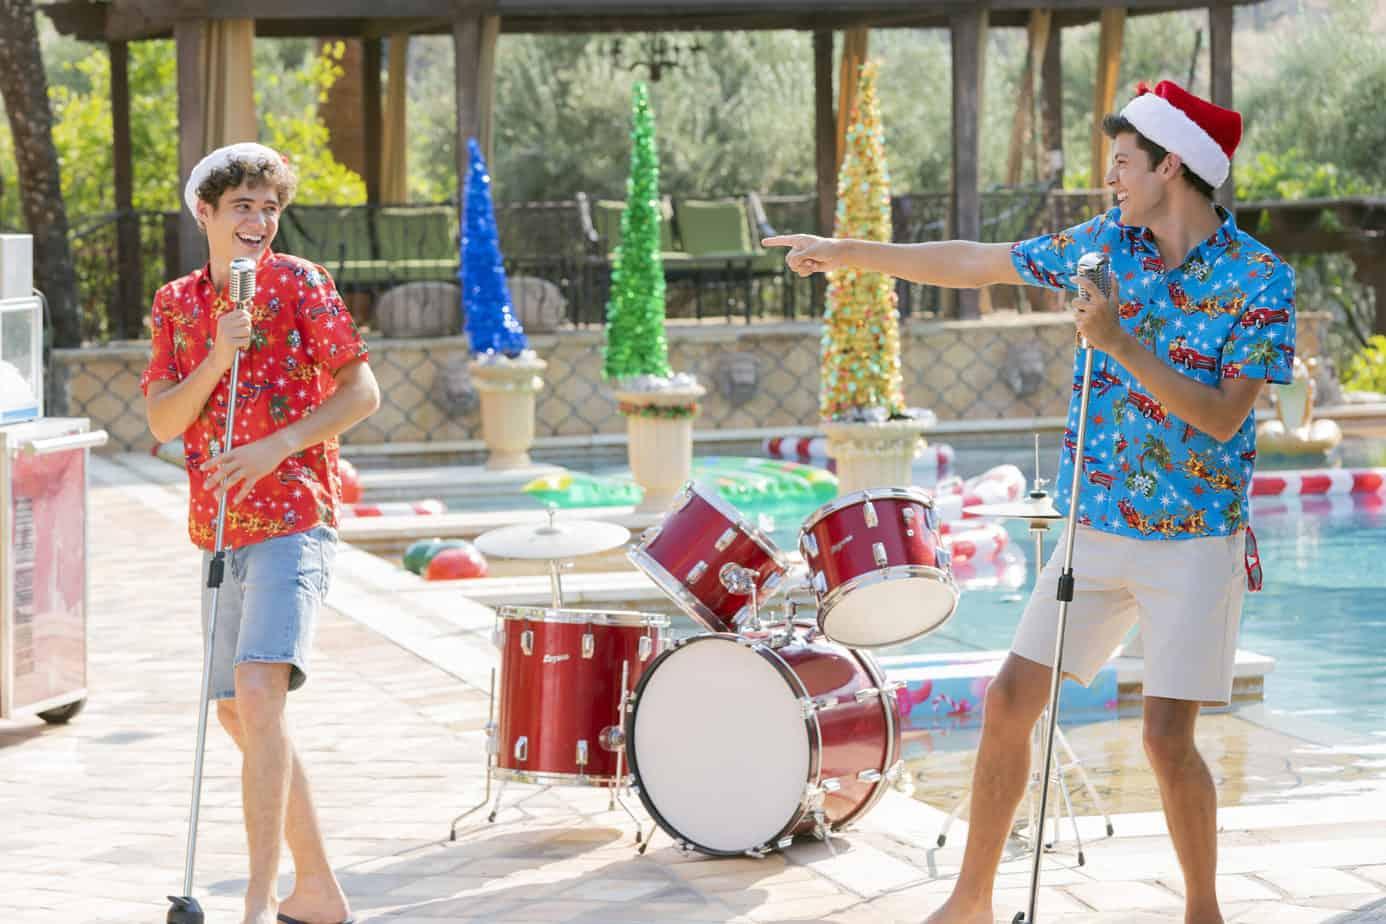 hsmtmts holiday special joshua bassett and Matt Cornett